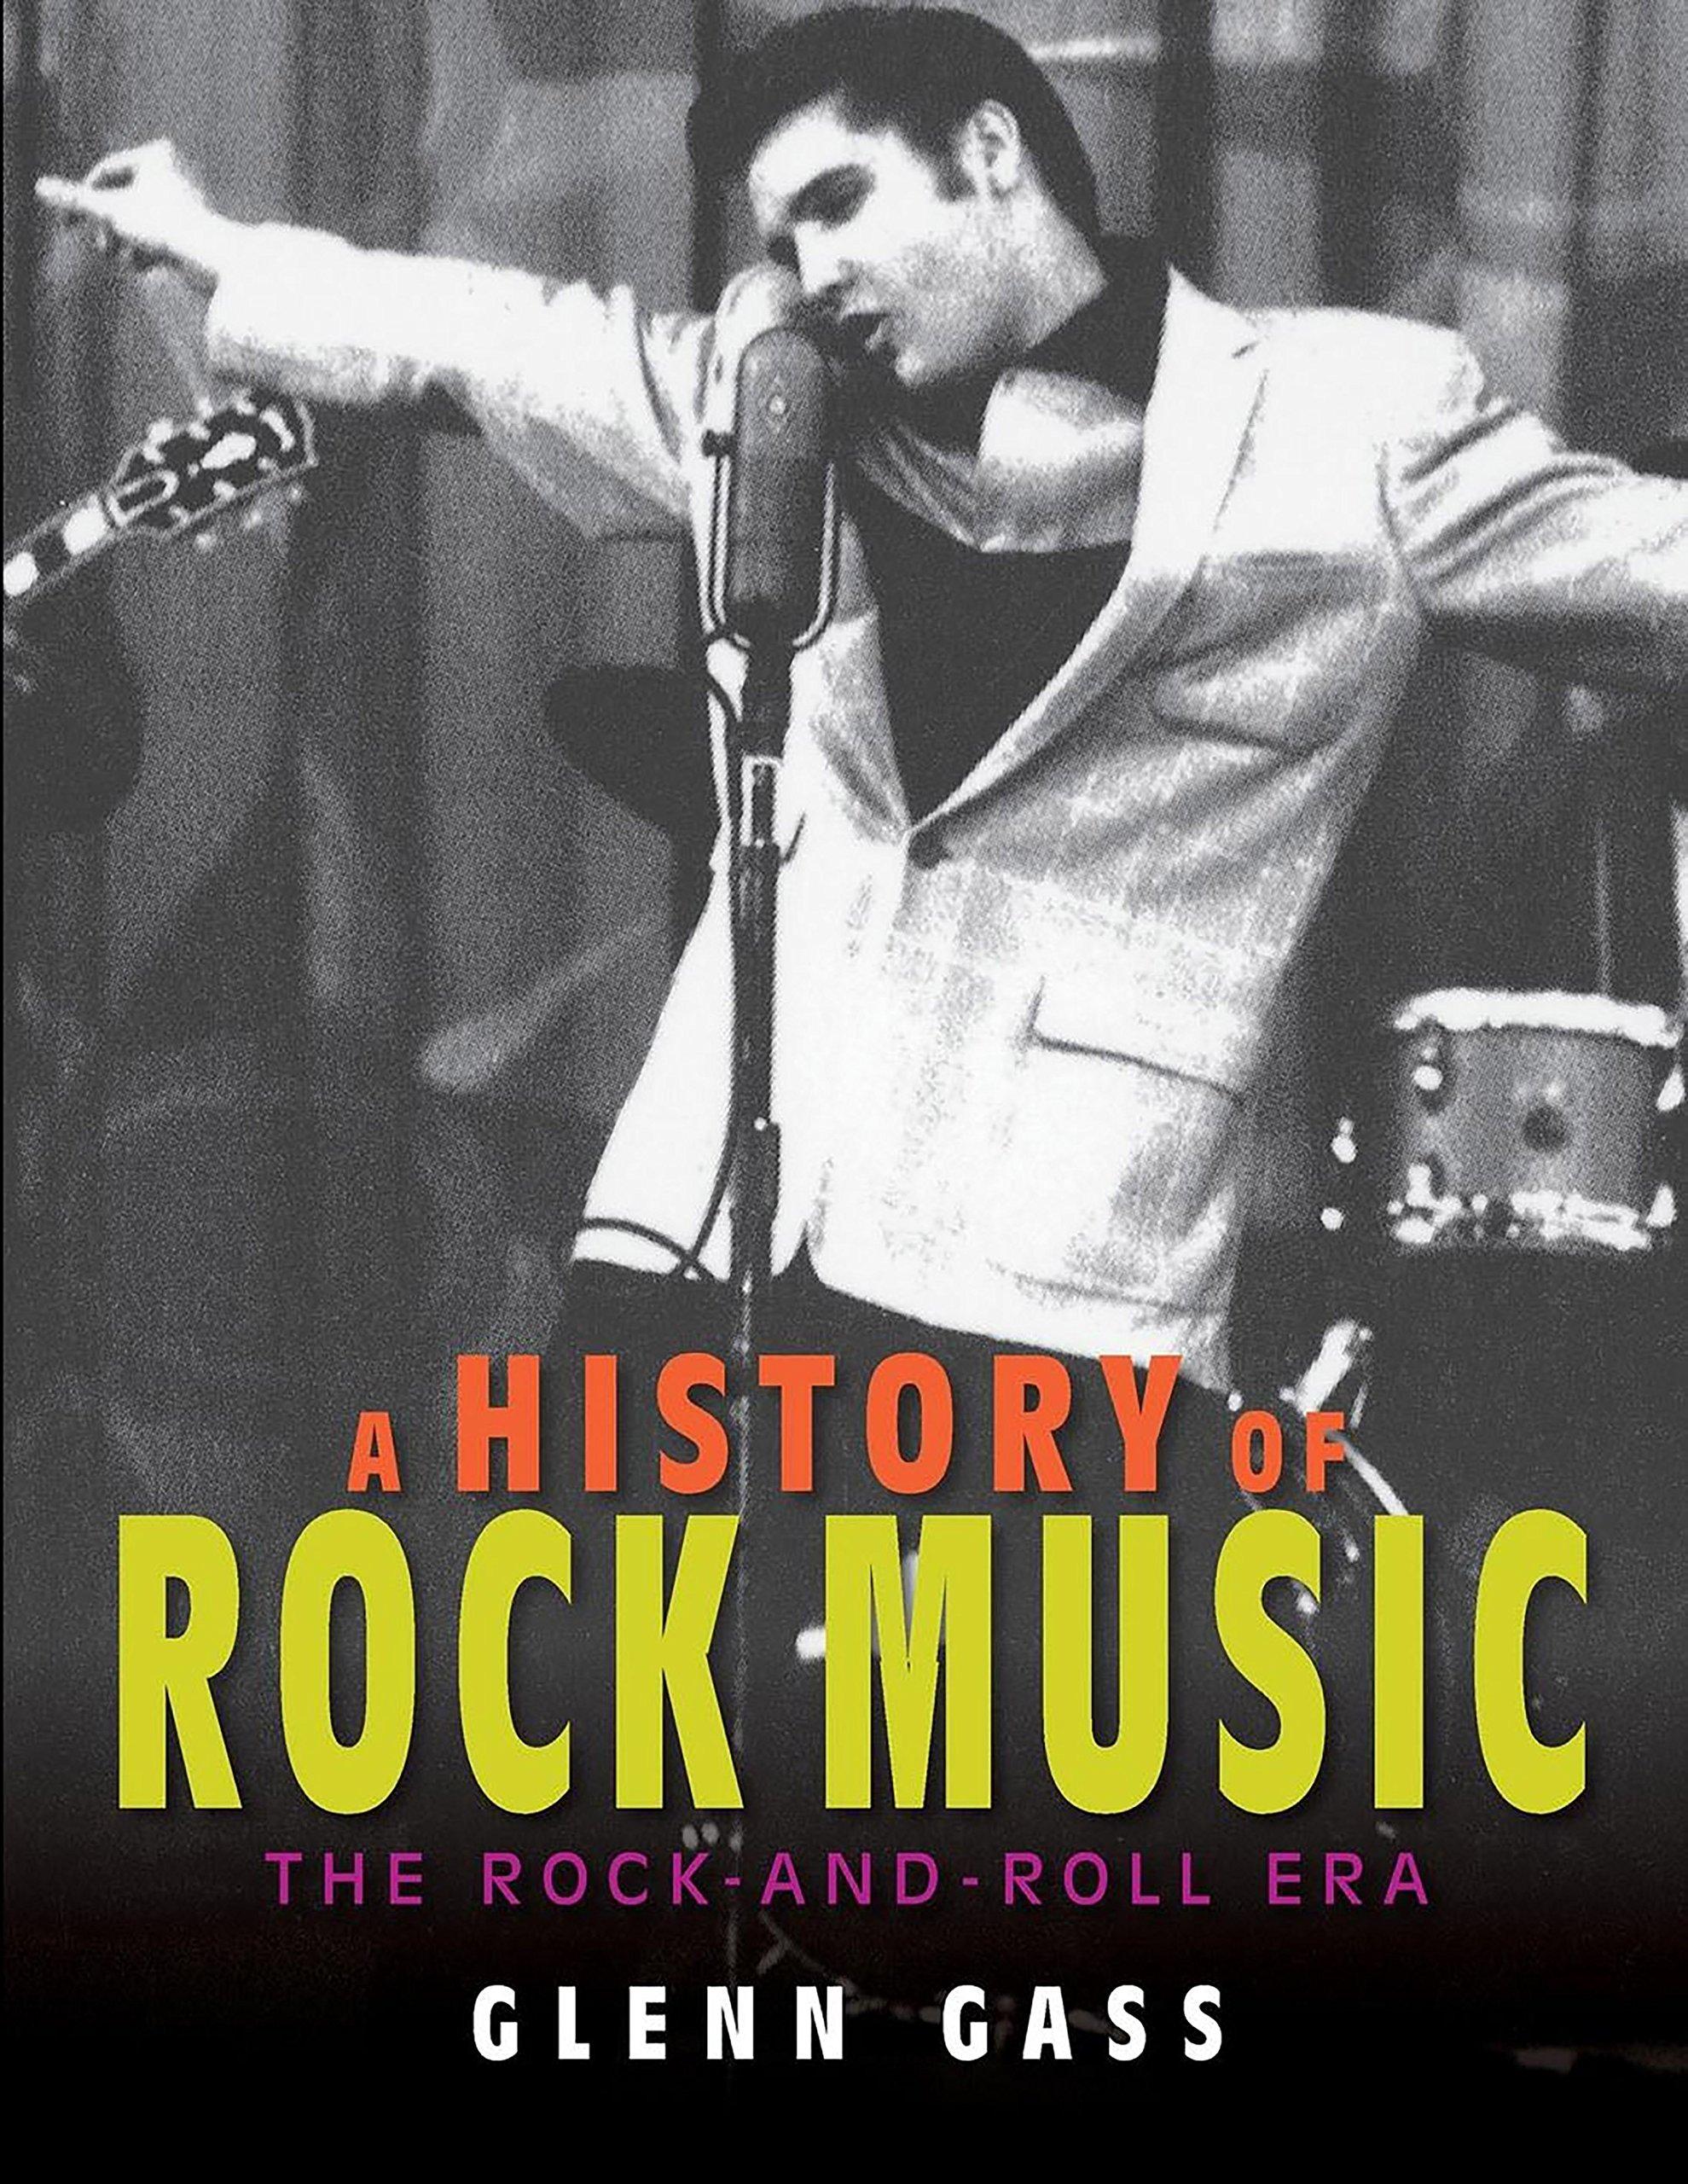 A History of Rock Music: The Rock-and-Roll Era: Glenn Gass: 9780253031501:  Amazon.com: Books